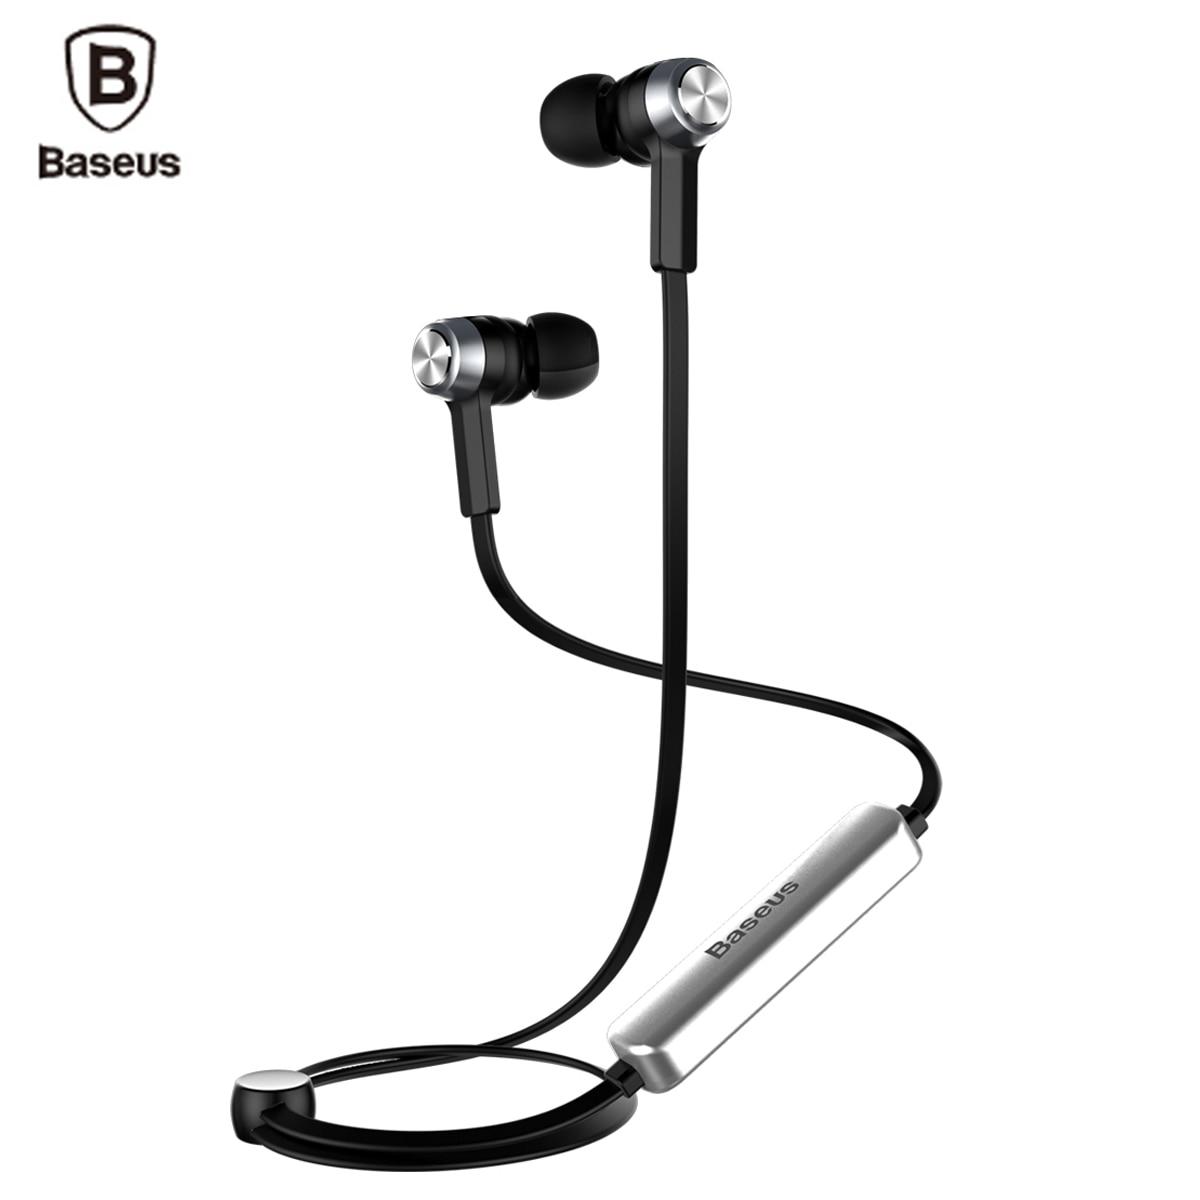 Baseus B11 Wireless Bluetooth Earphone Sport Headset Headphone Fone de ouvido Stereo Earbuds Neckband Ecouteur Auriculares